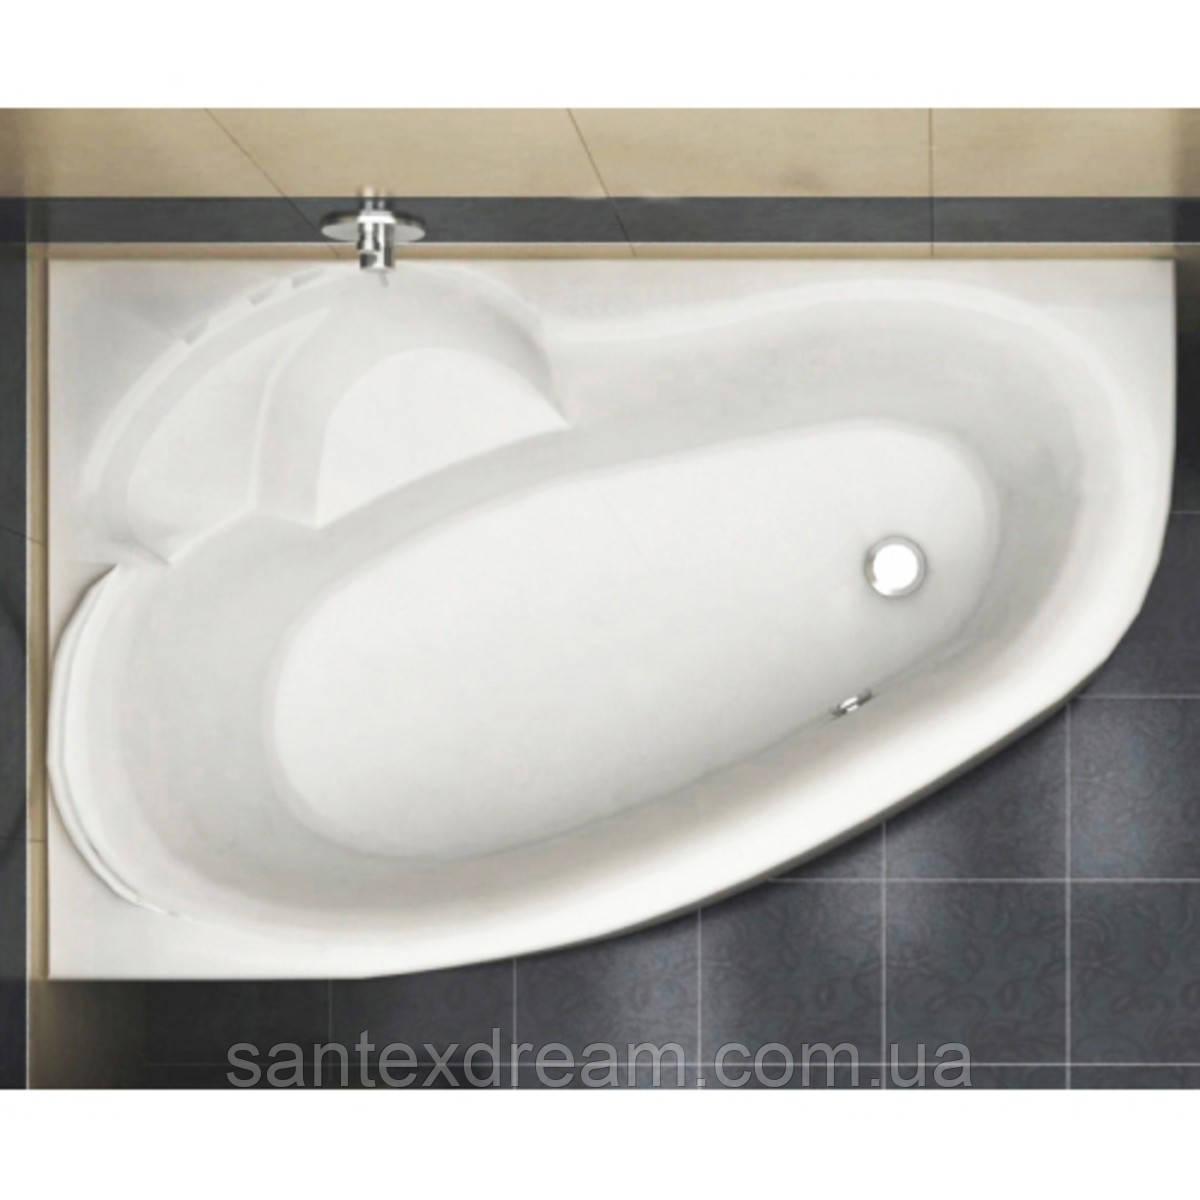 Ванна Koller Pool Karina 170x110 левая